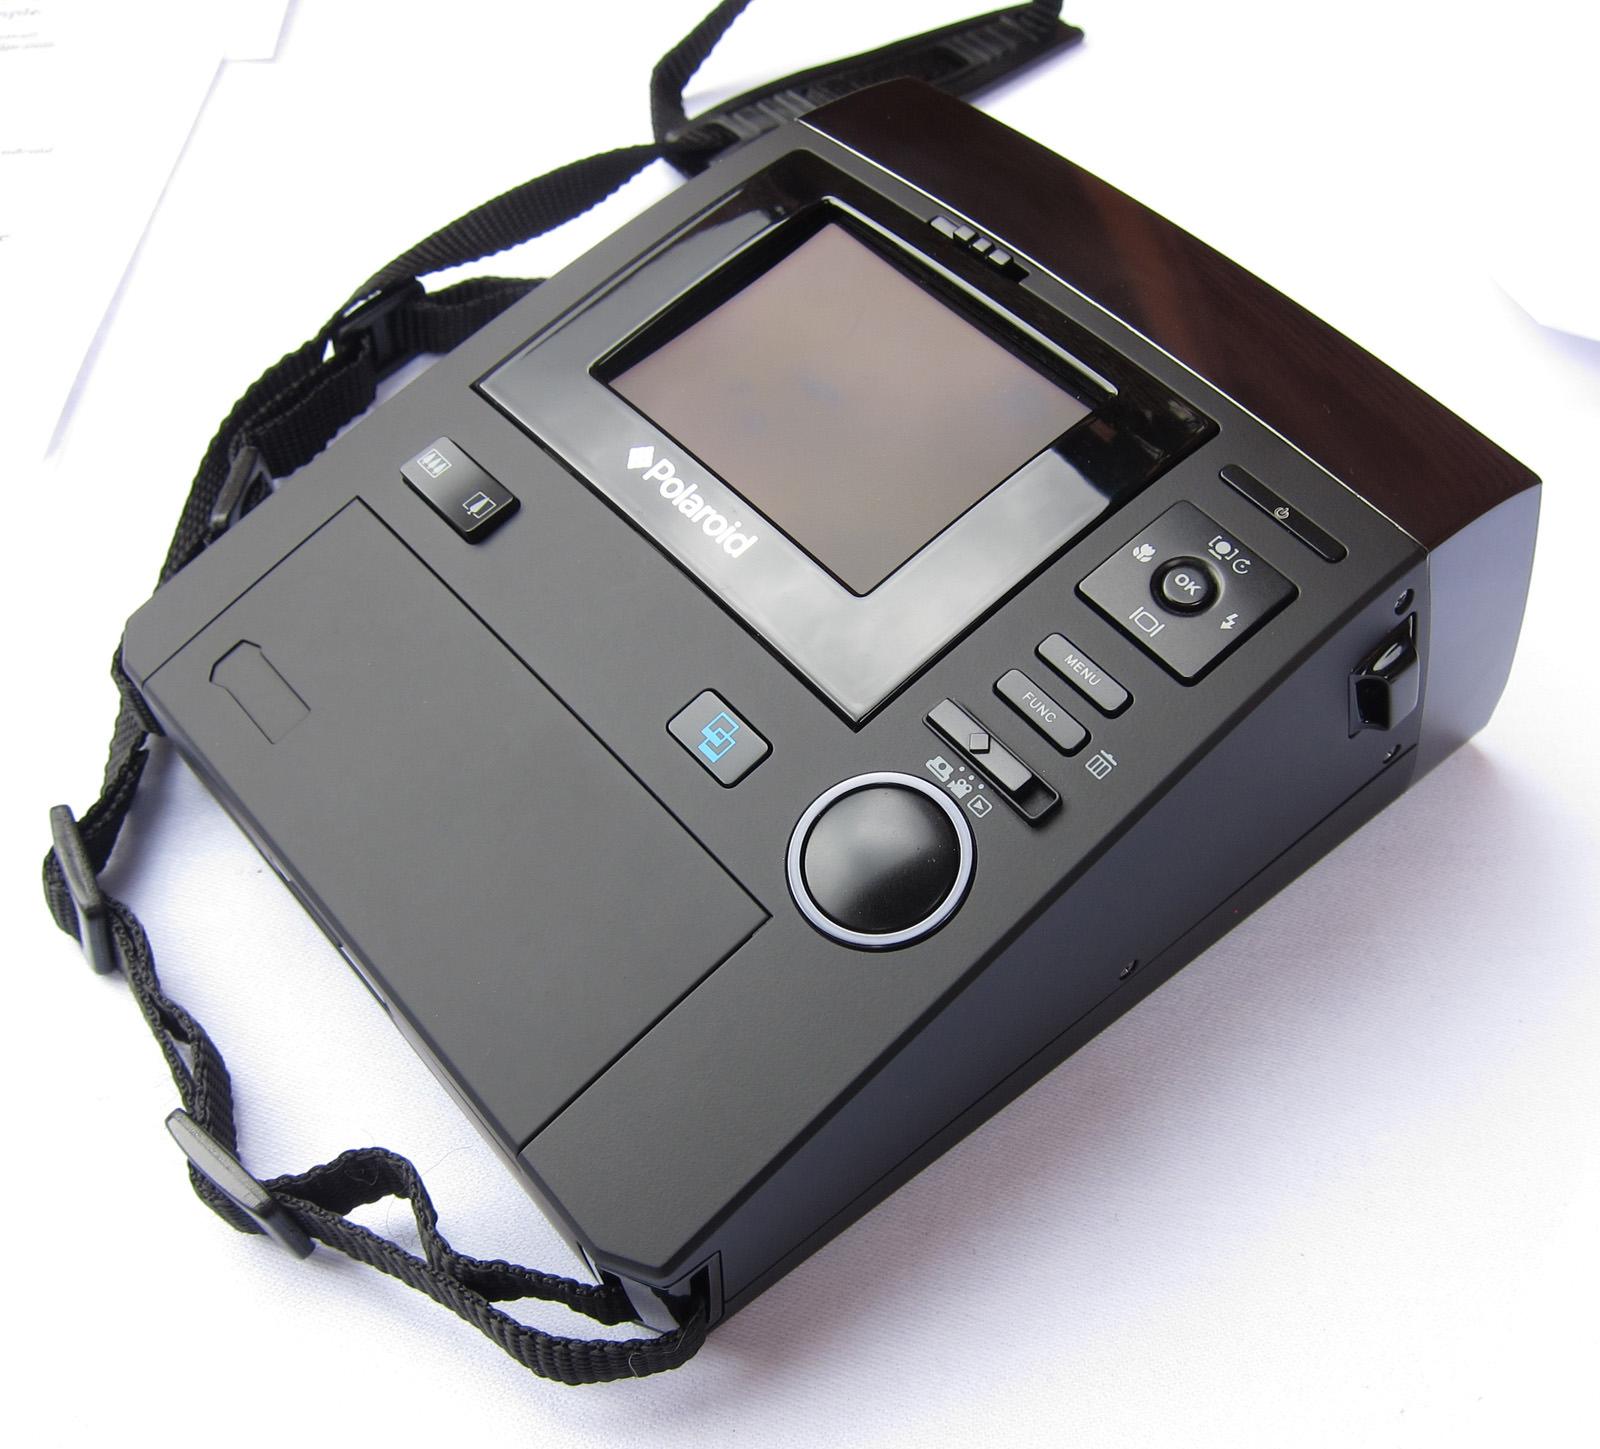 Polaroid Z340 Instant Camera Hands On Preview | ePHOTOzine